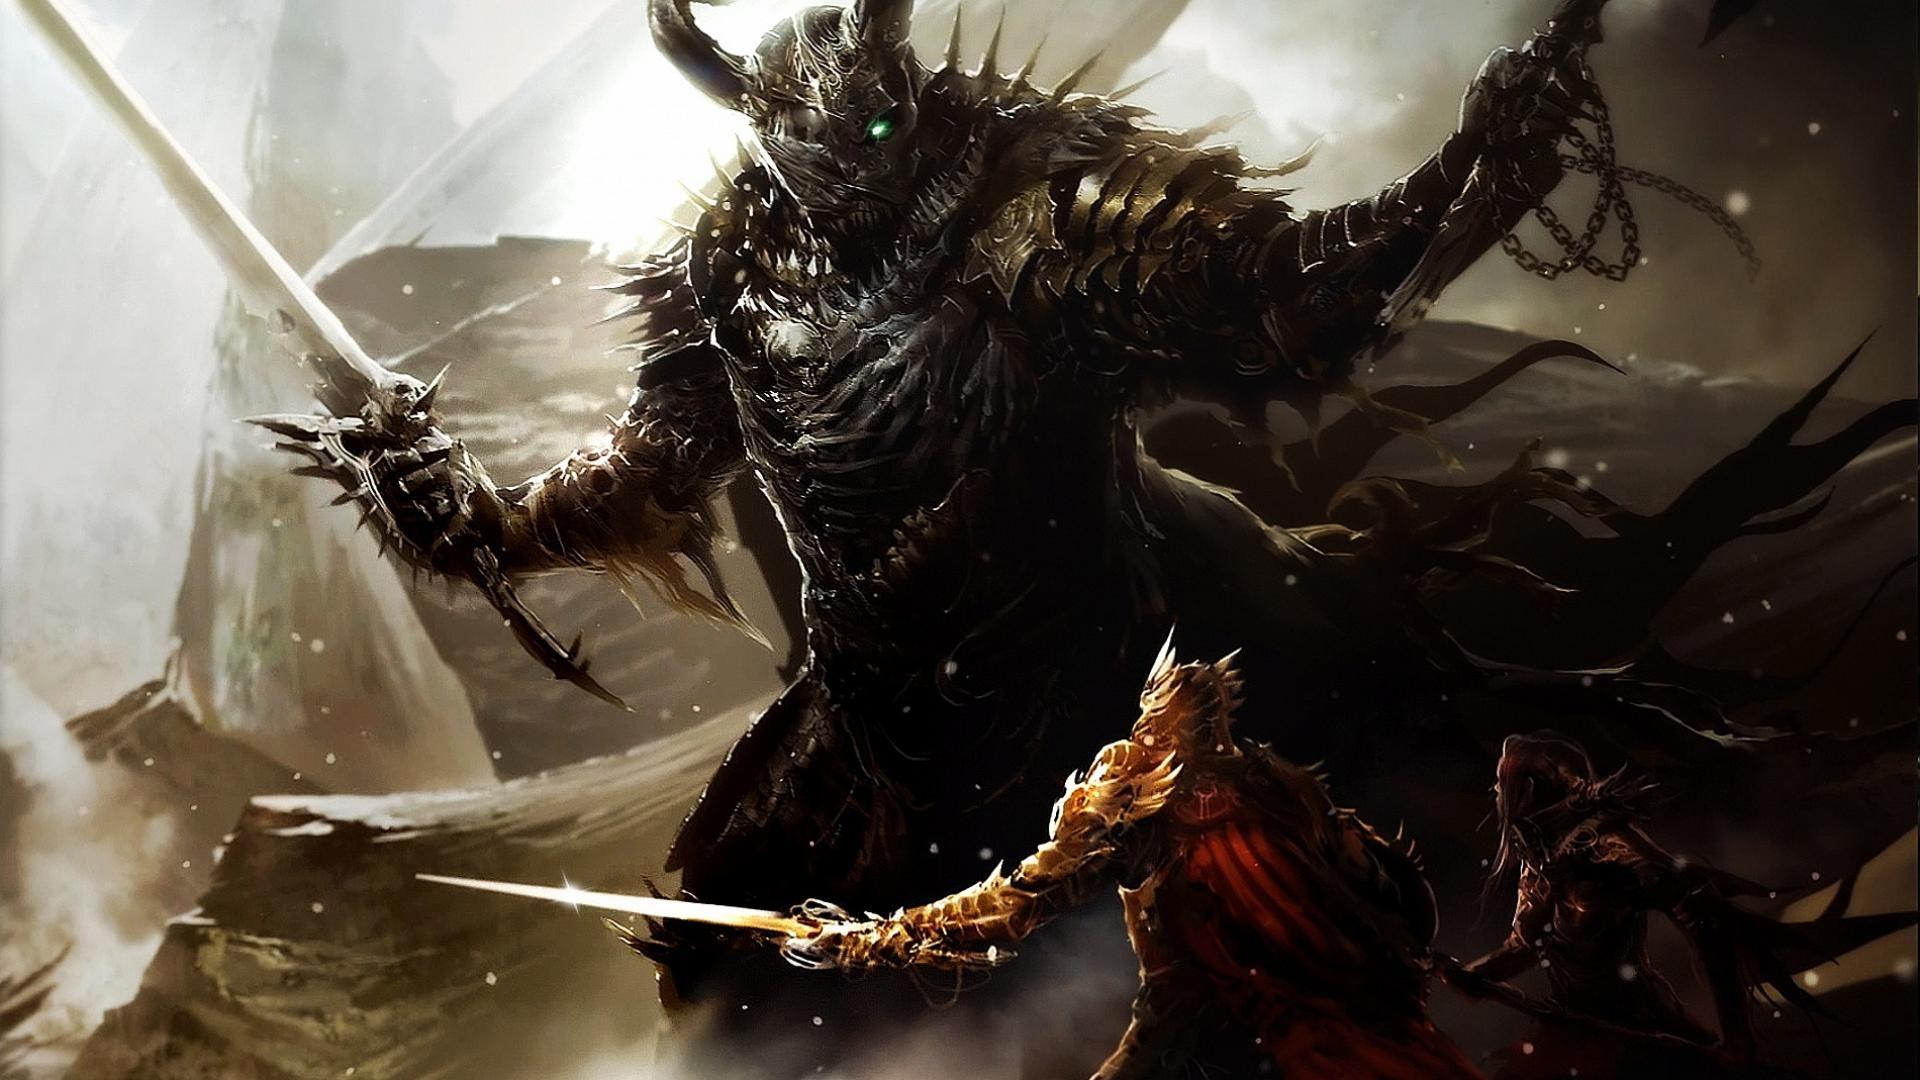 Epic monster war naked photo